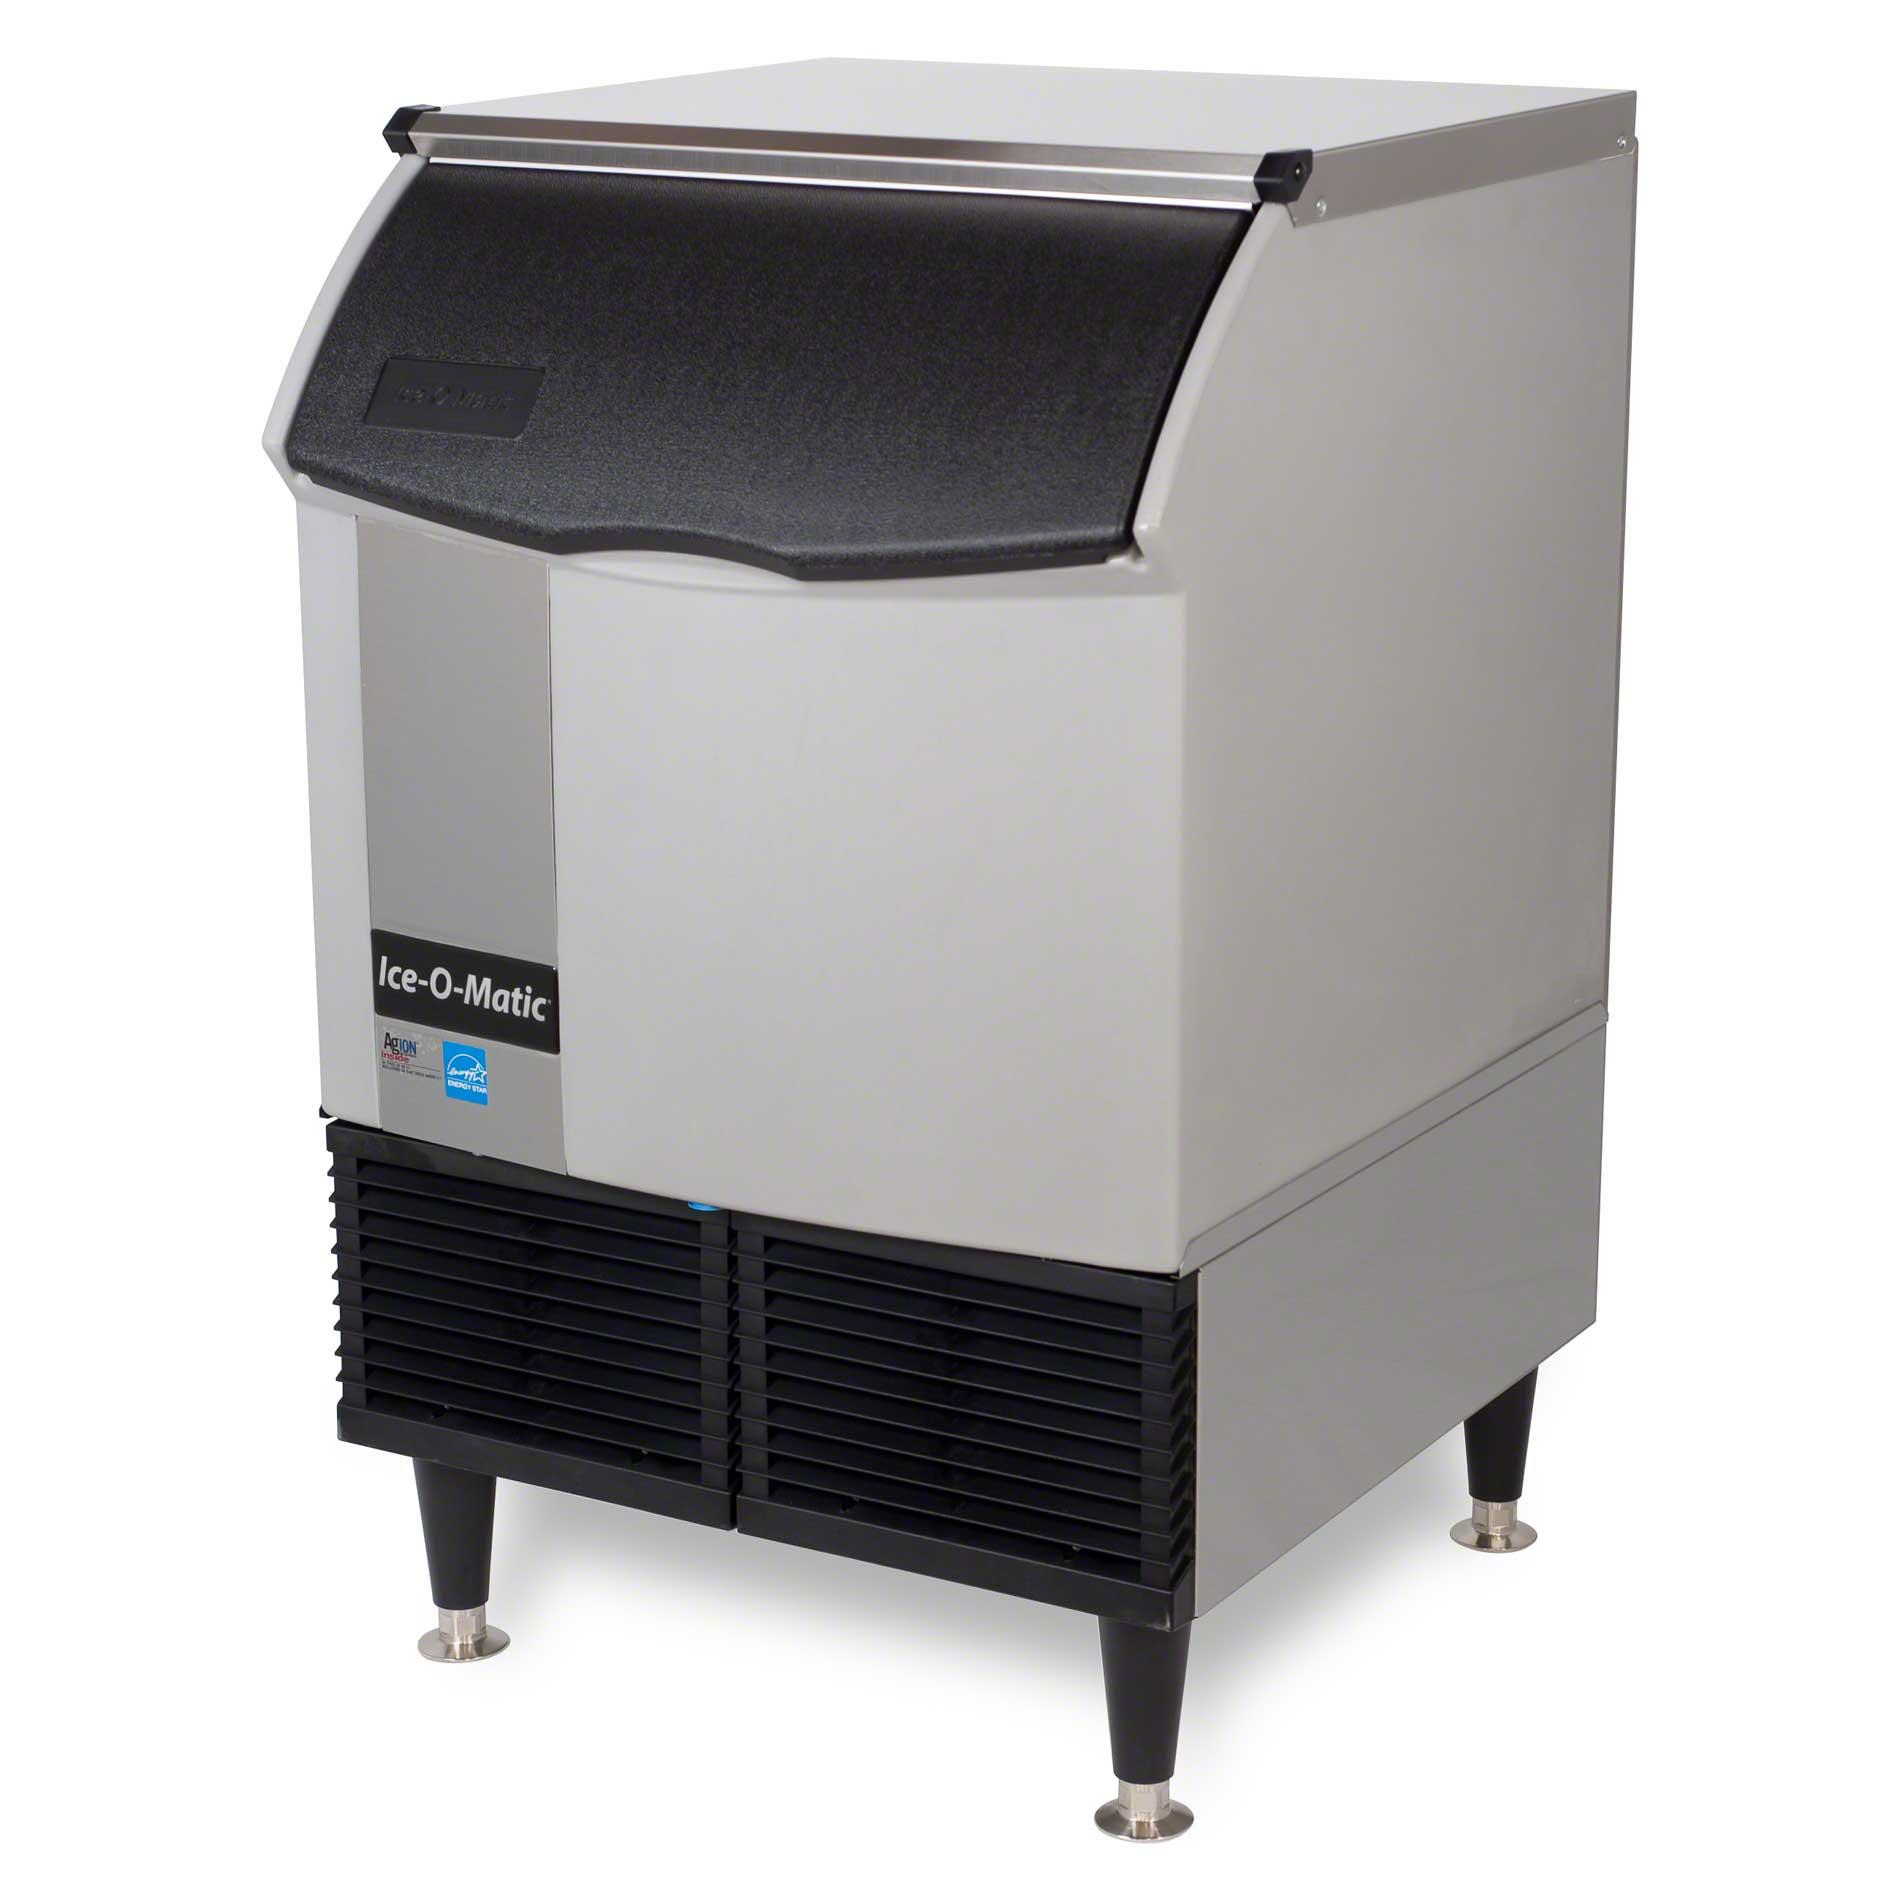 ice o matic iceu150fa 185 lb ice maker chefs corner flanders nj - Ice O Matic Ice Machine